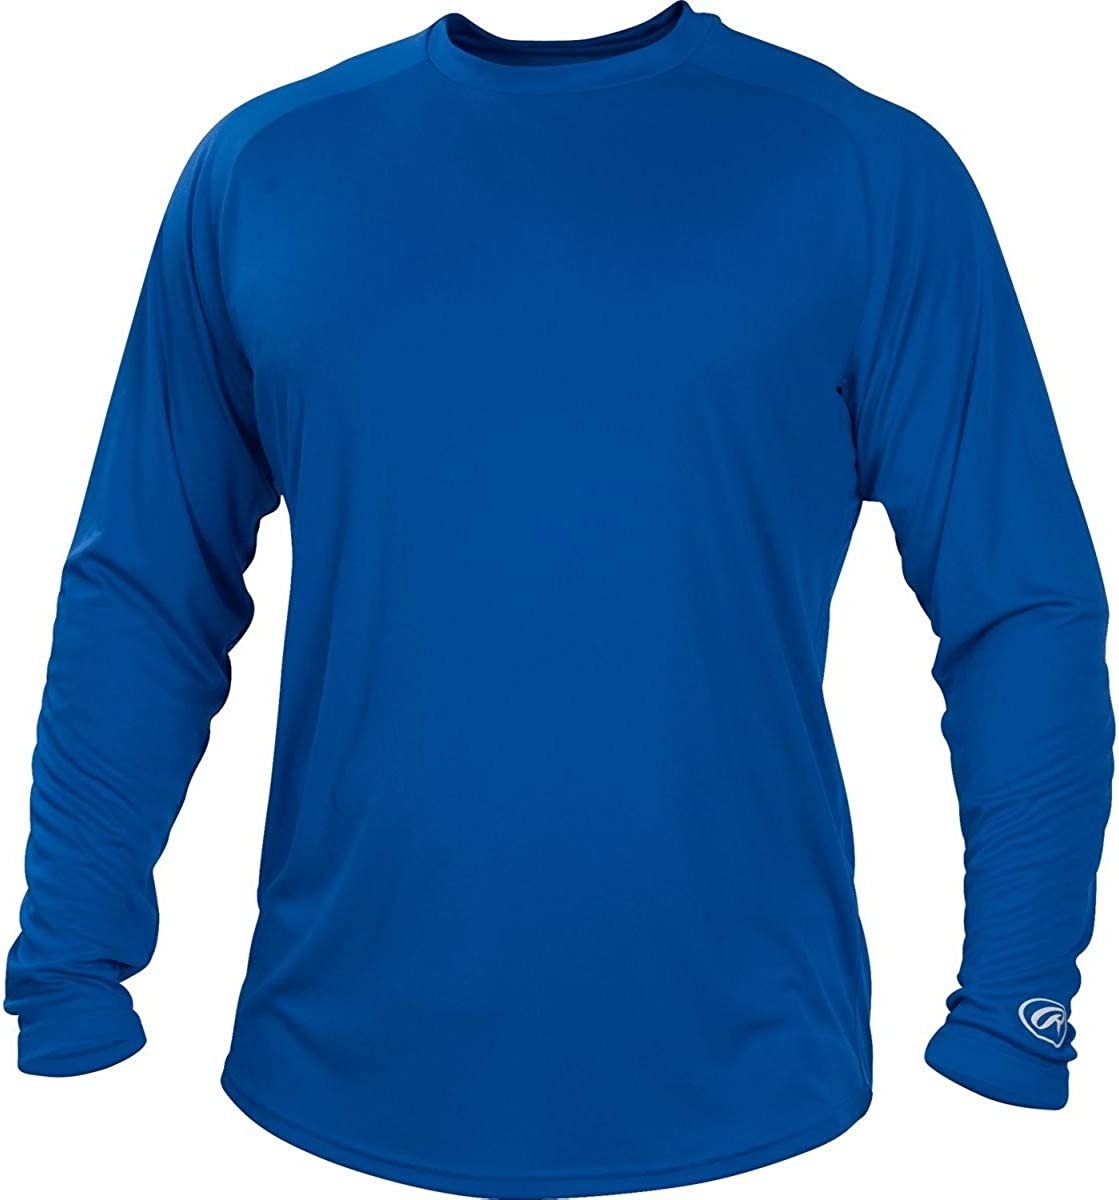 Rawlings Boys Youth Tech Long Sleeve Shirt Series